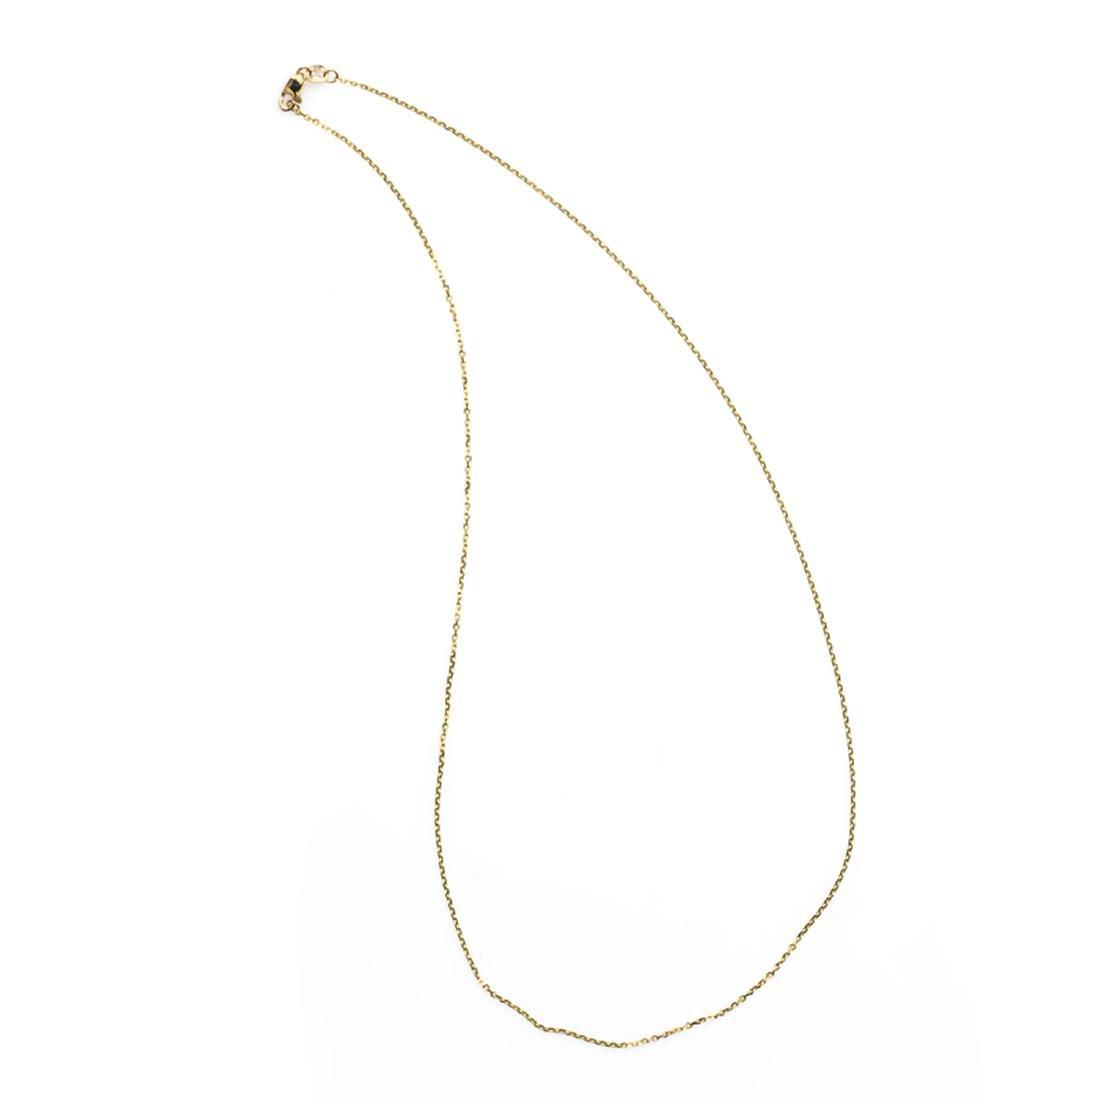 *Fine Jewelry 14KT Gold, Diamond Cut, 1.8GR. 18'' Chain